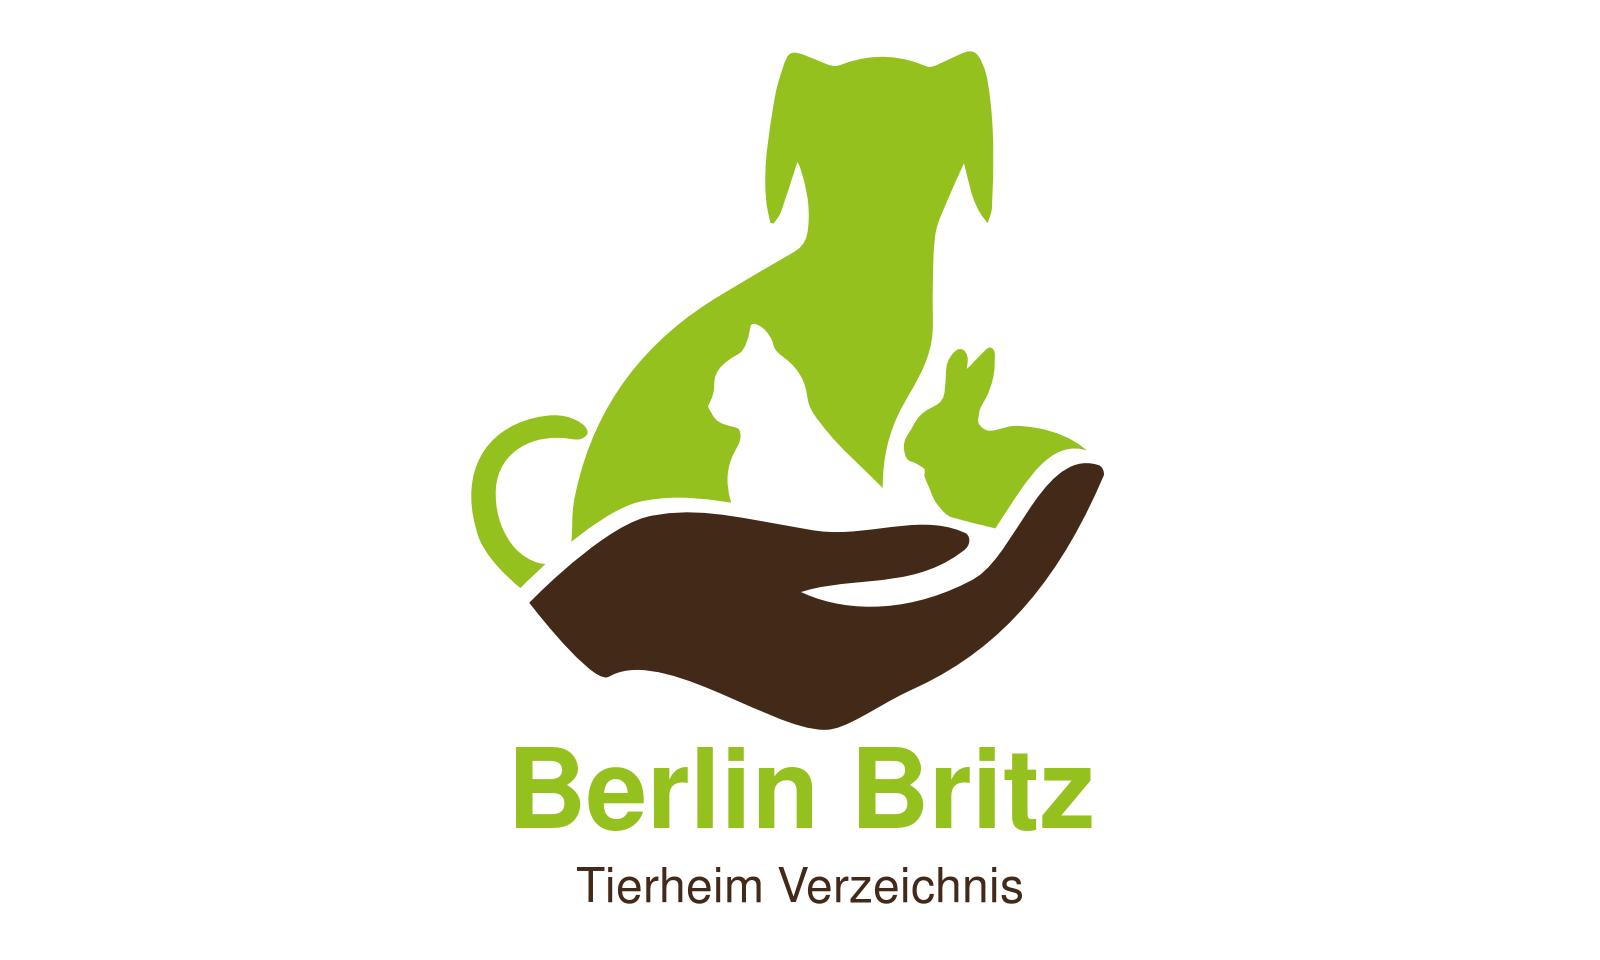 Tierheim Berlin Britz